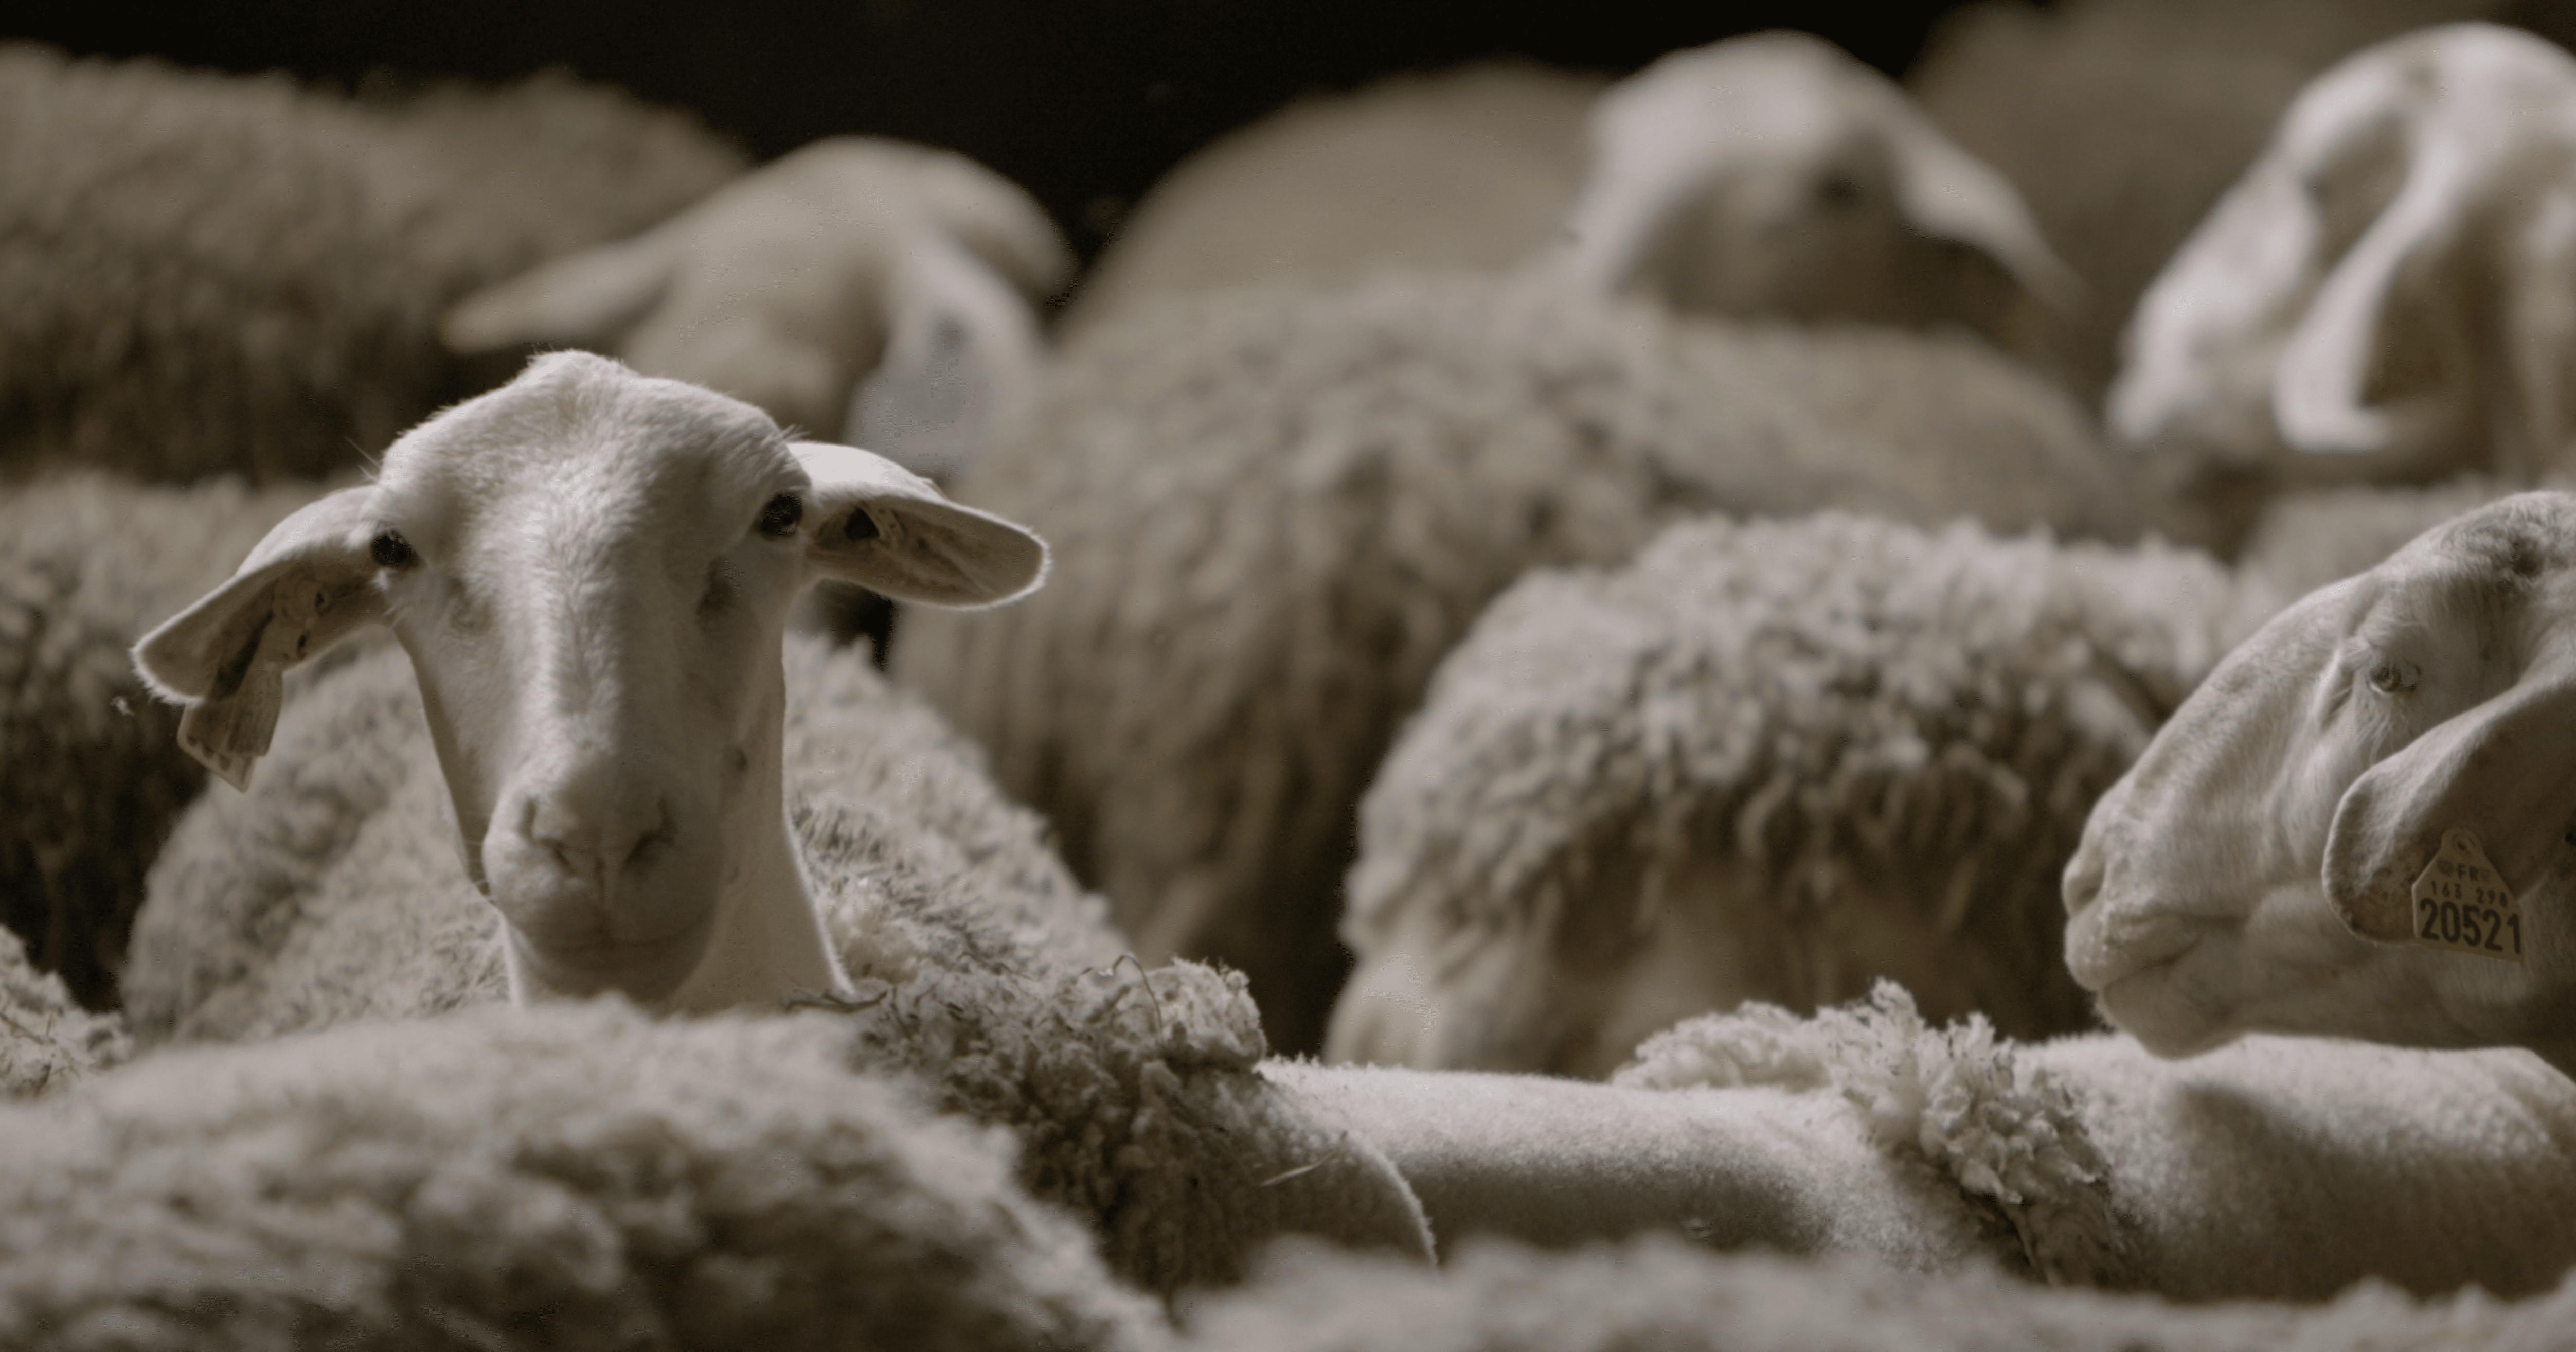 jayus-brand-content-production-atelier tuffery film laine